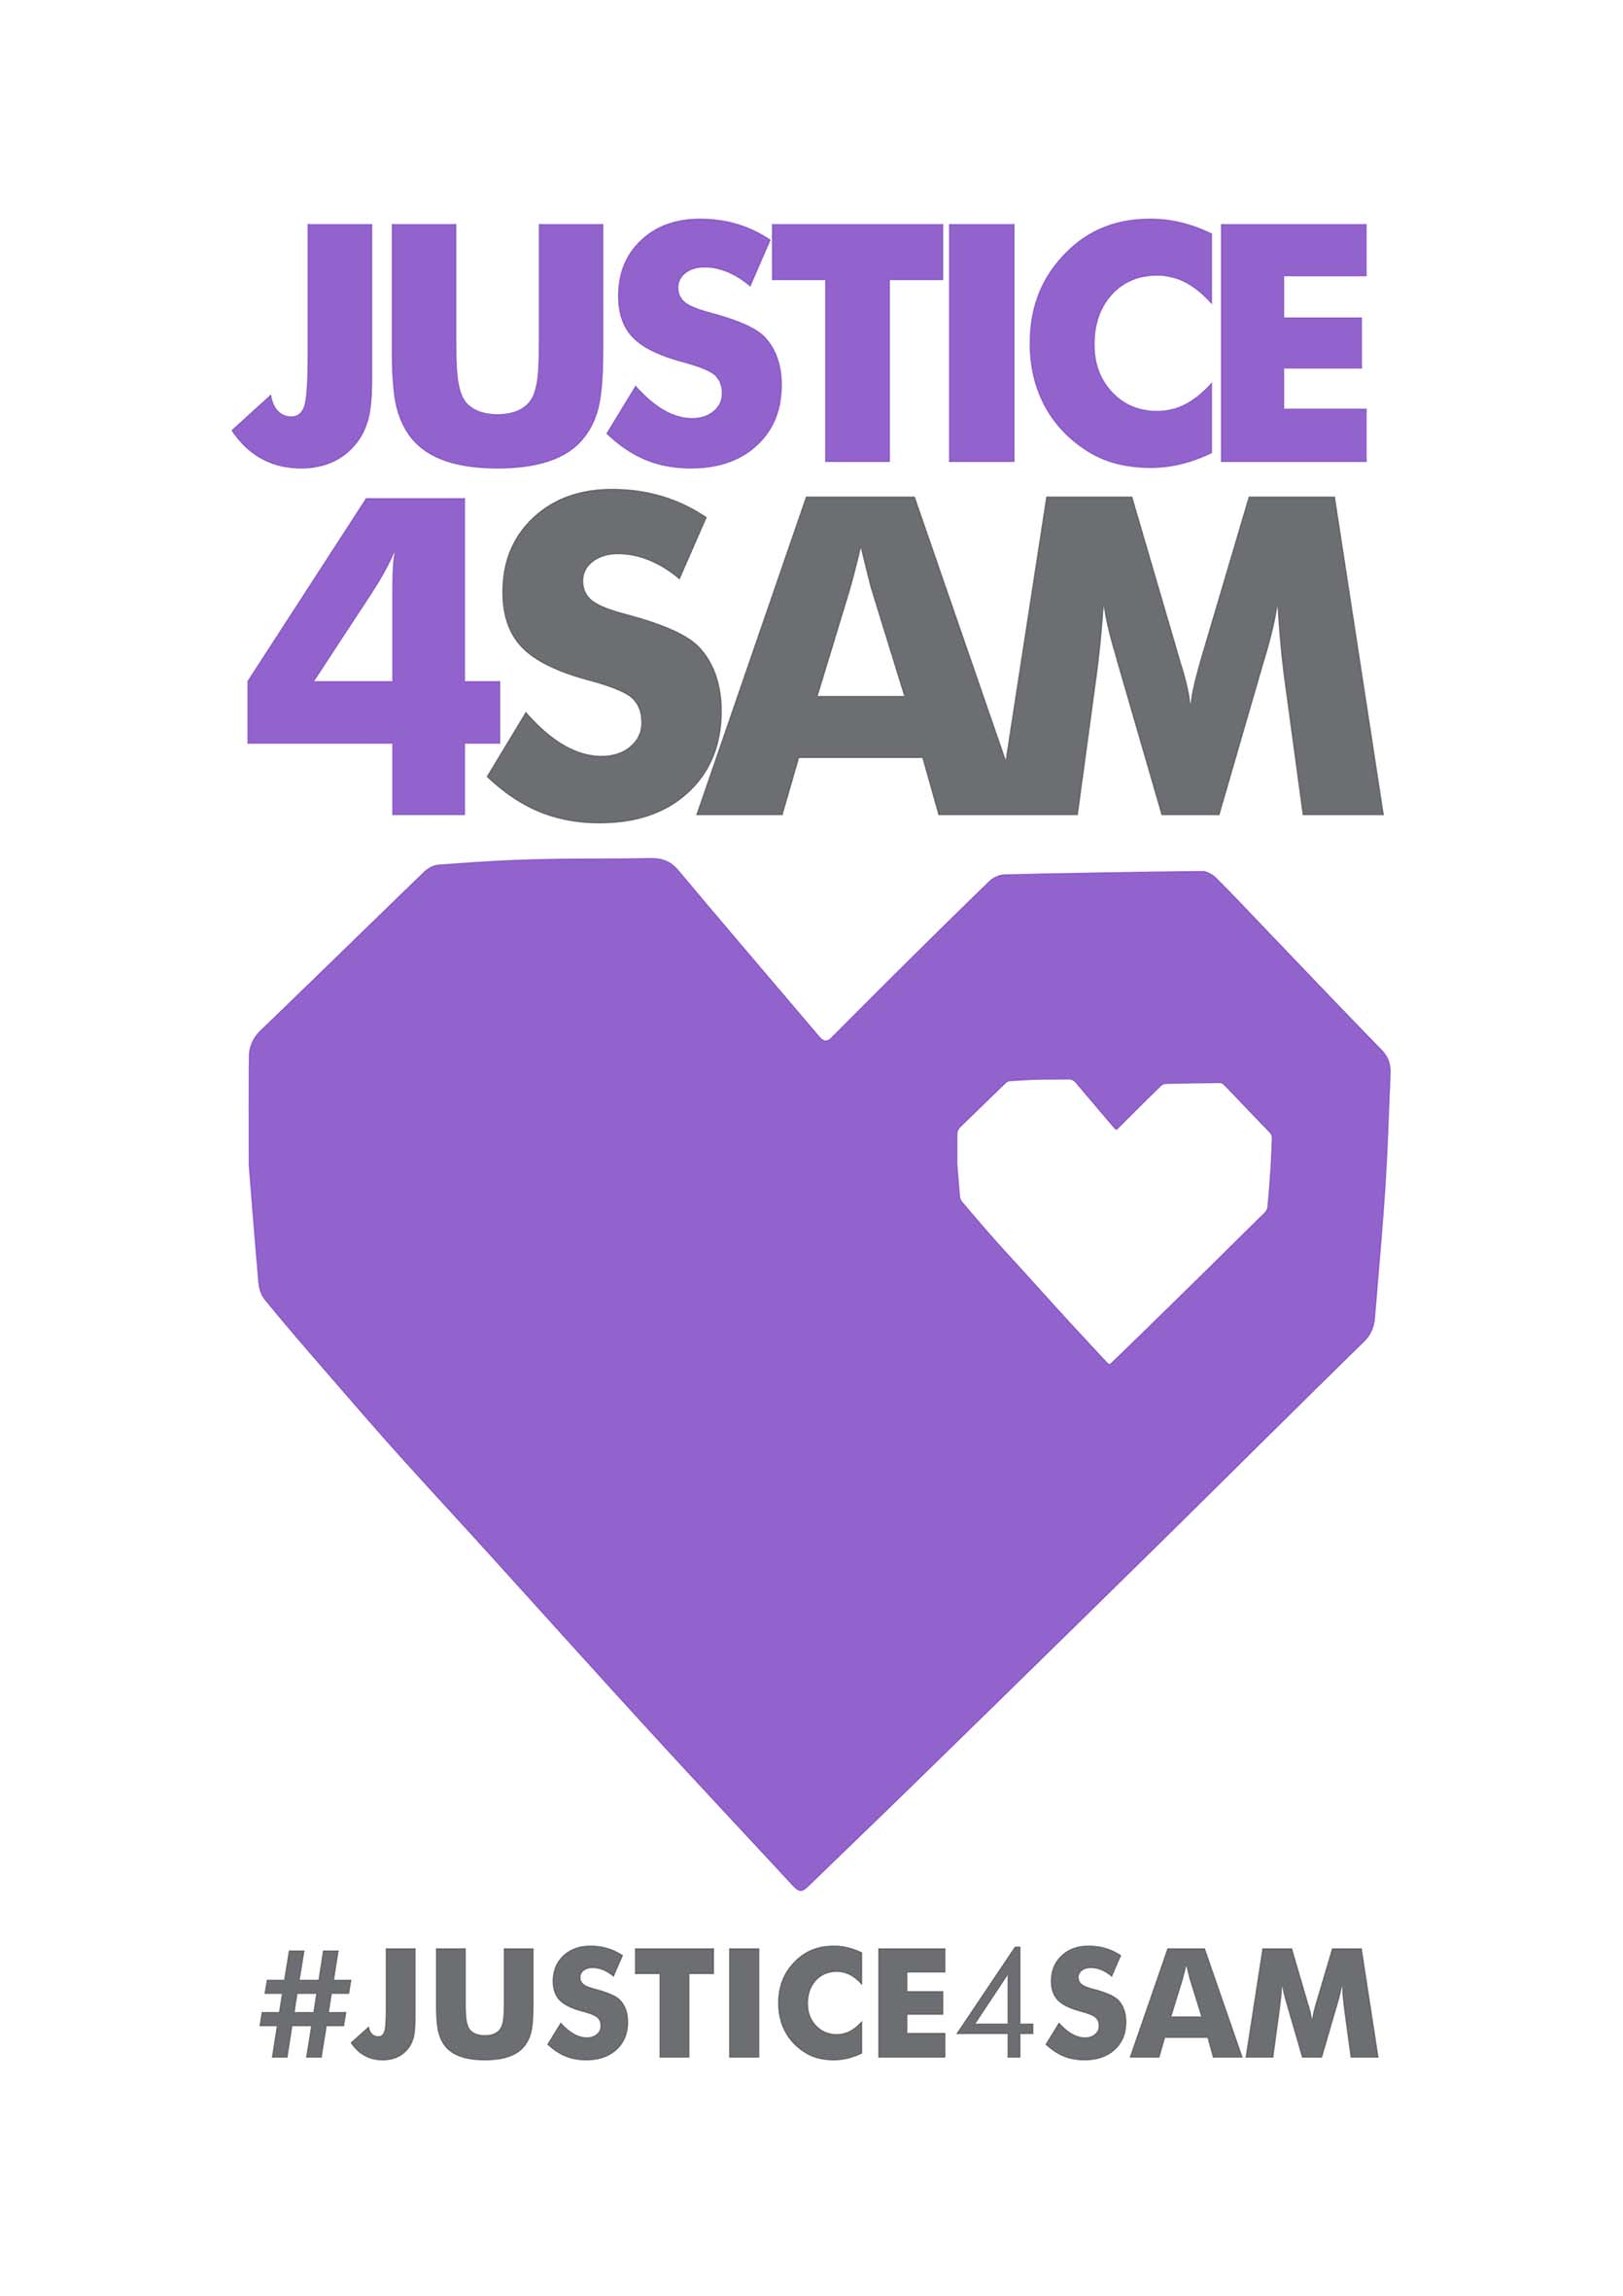 JUSTICE4SAM LOGO